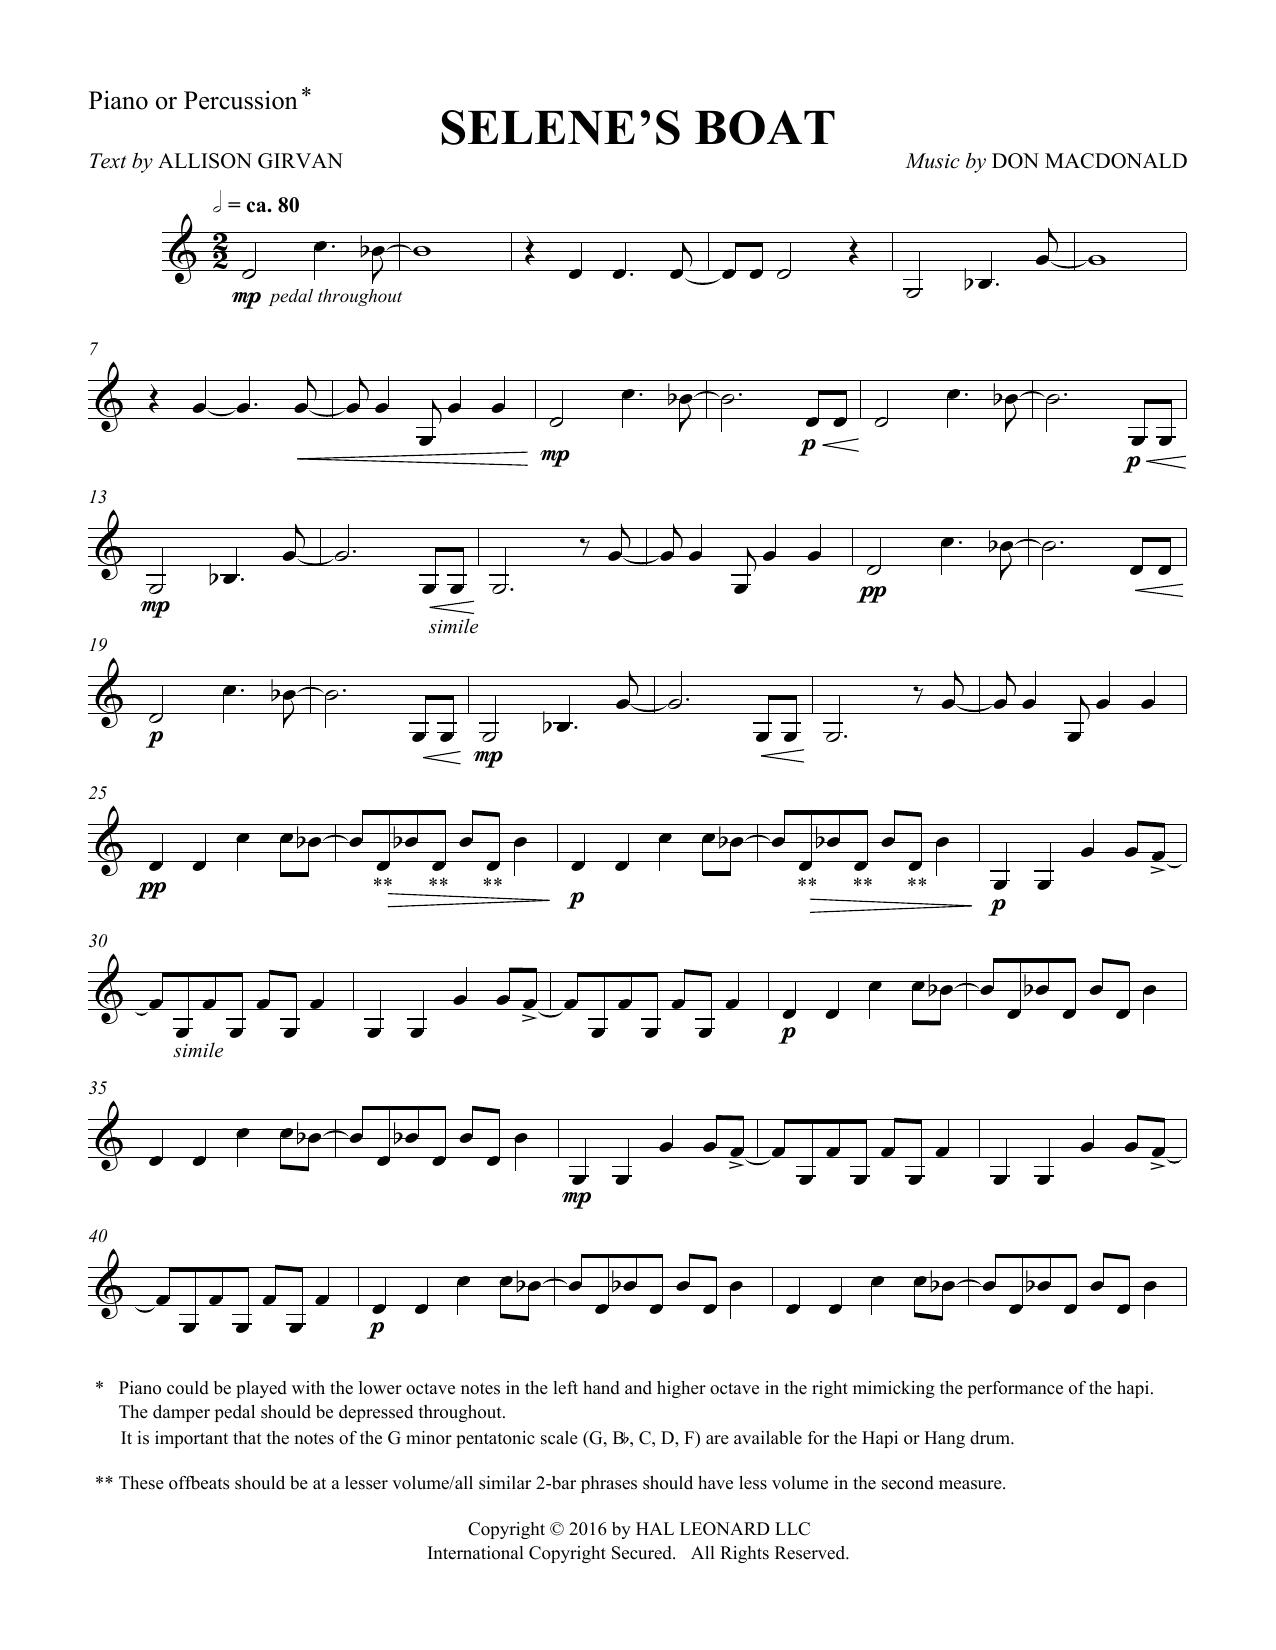 Selene's Boat - Percussion